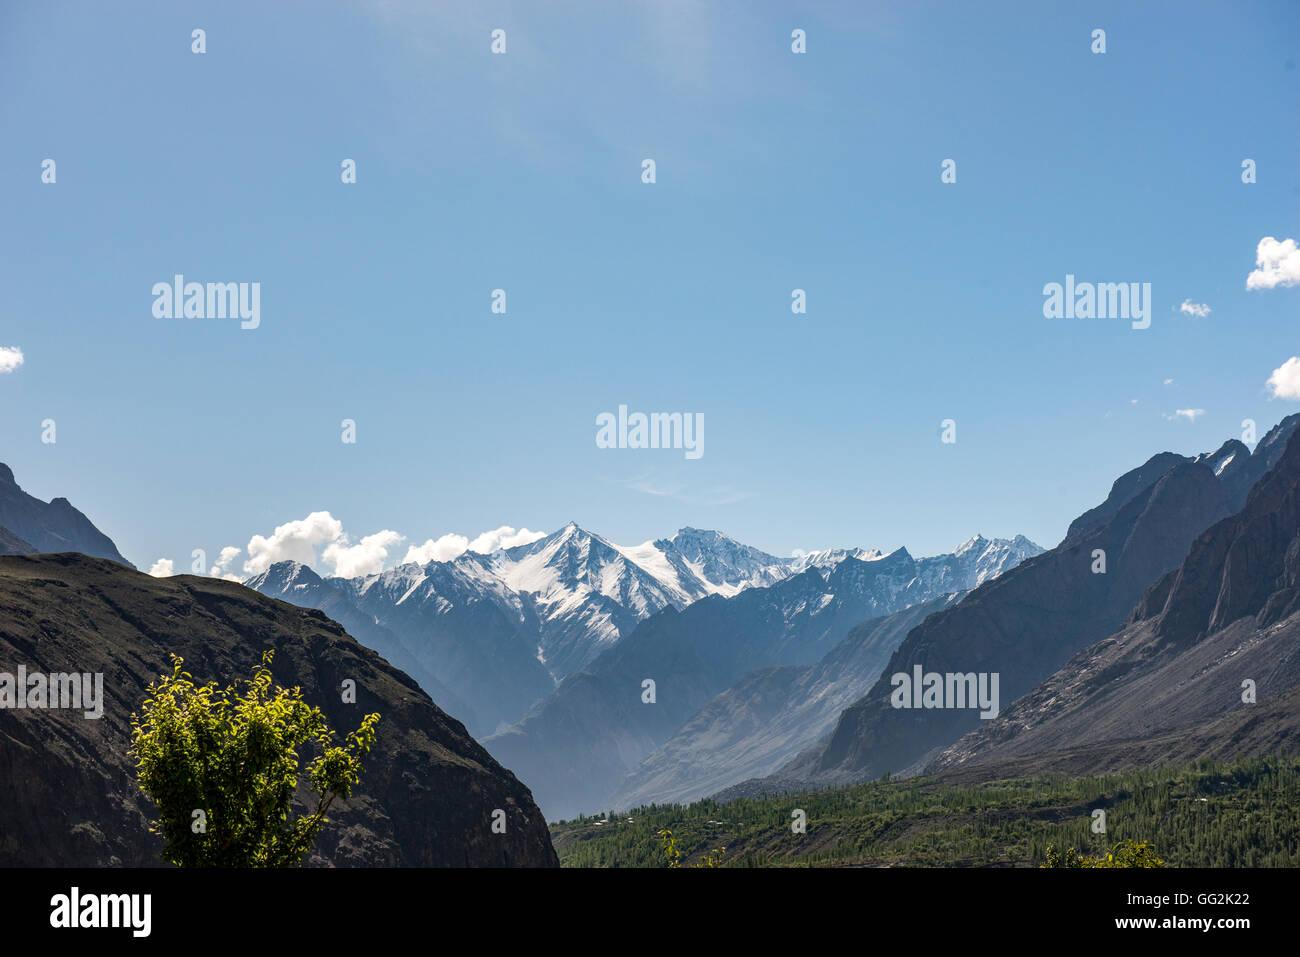 View of Hindu Kush mountains from Mastuj - Stock Image